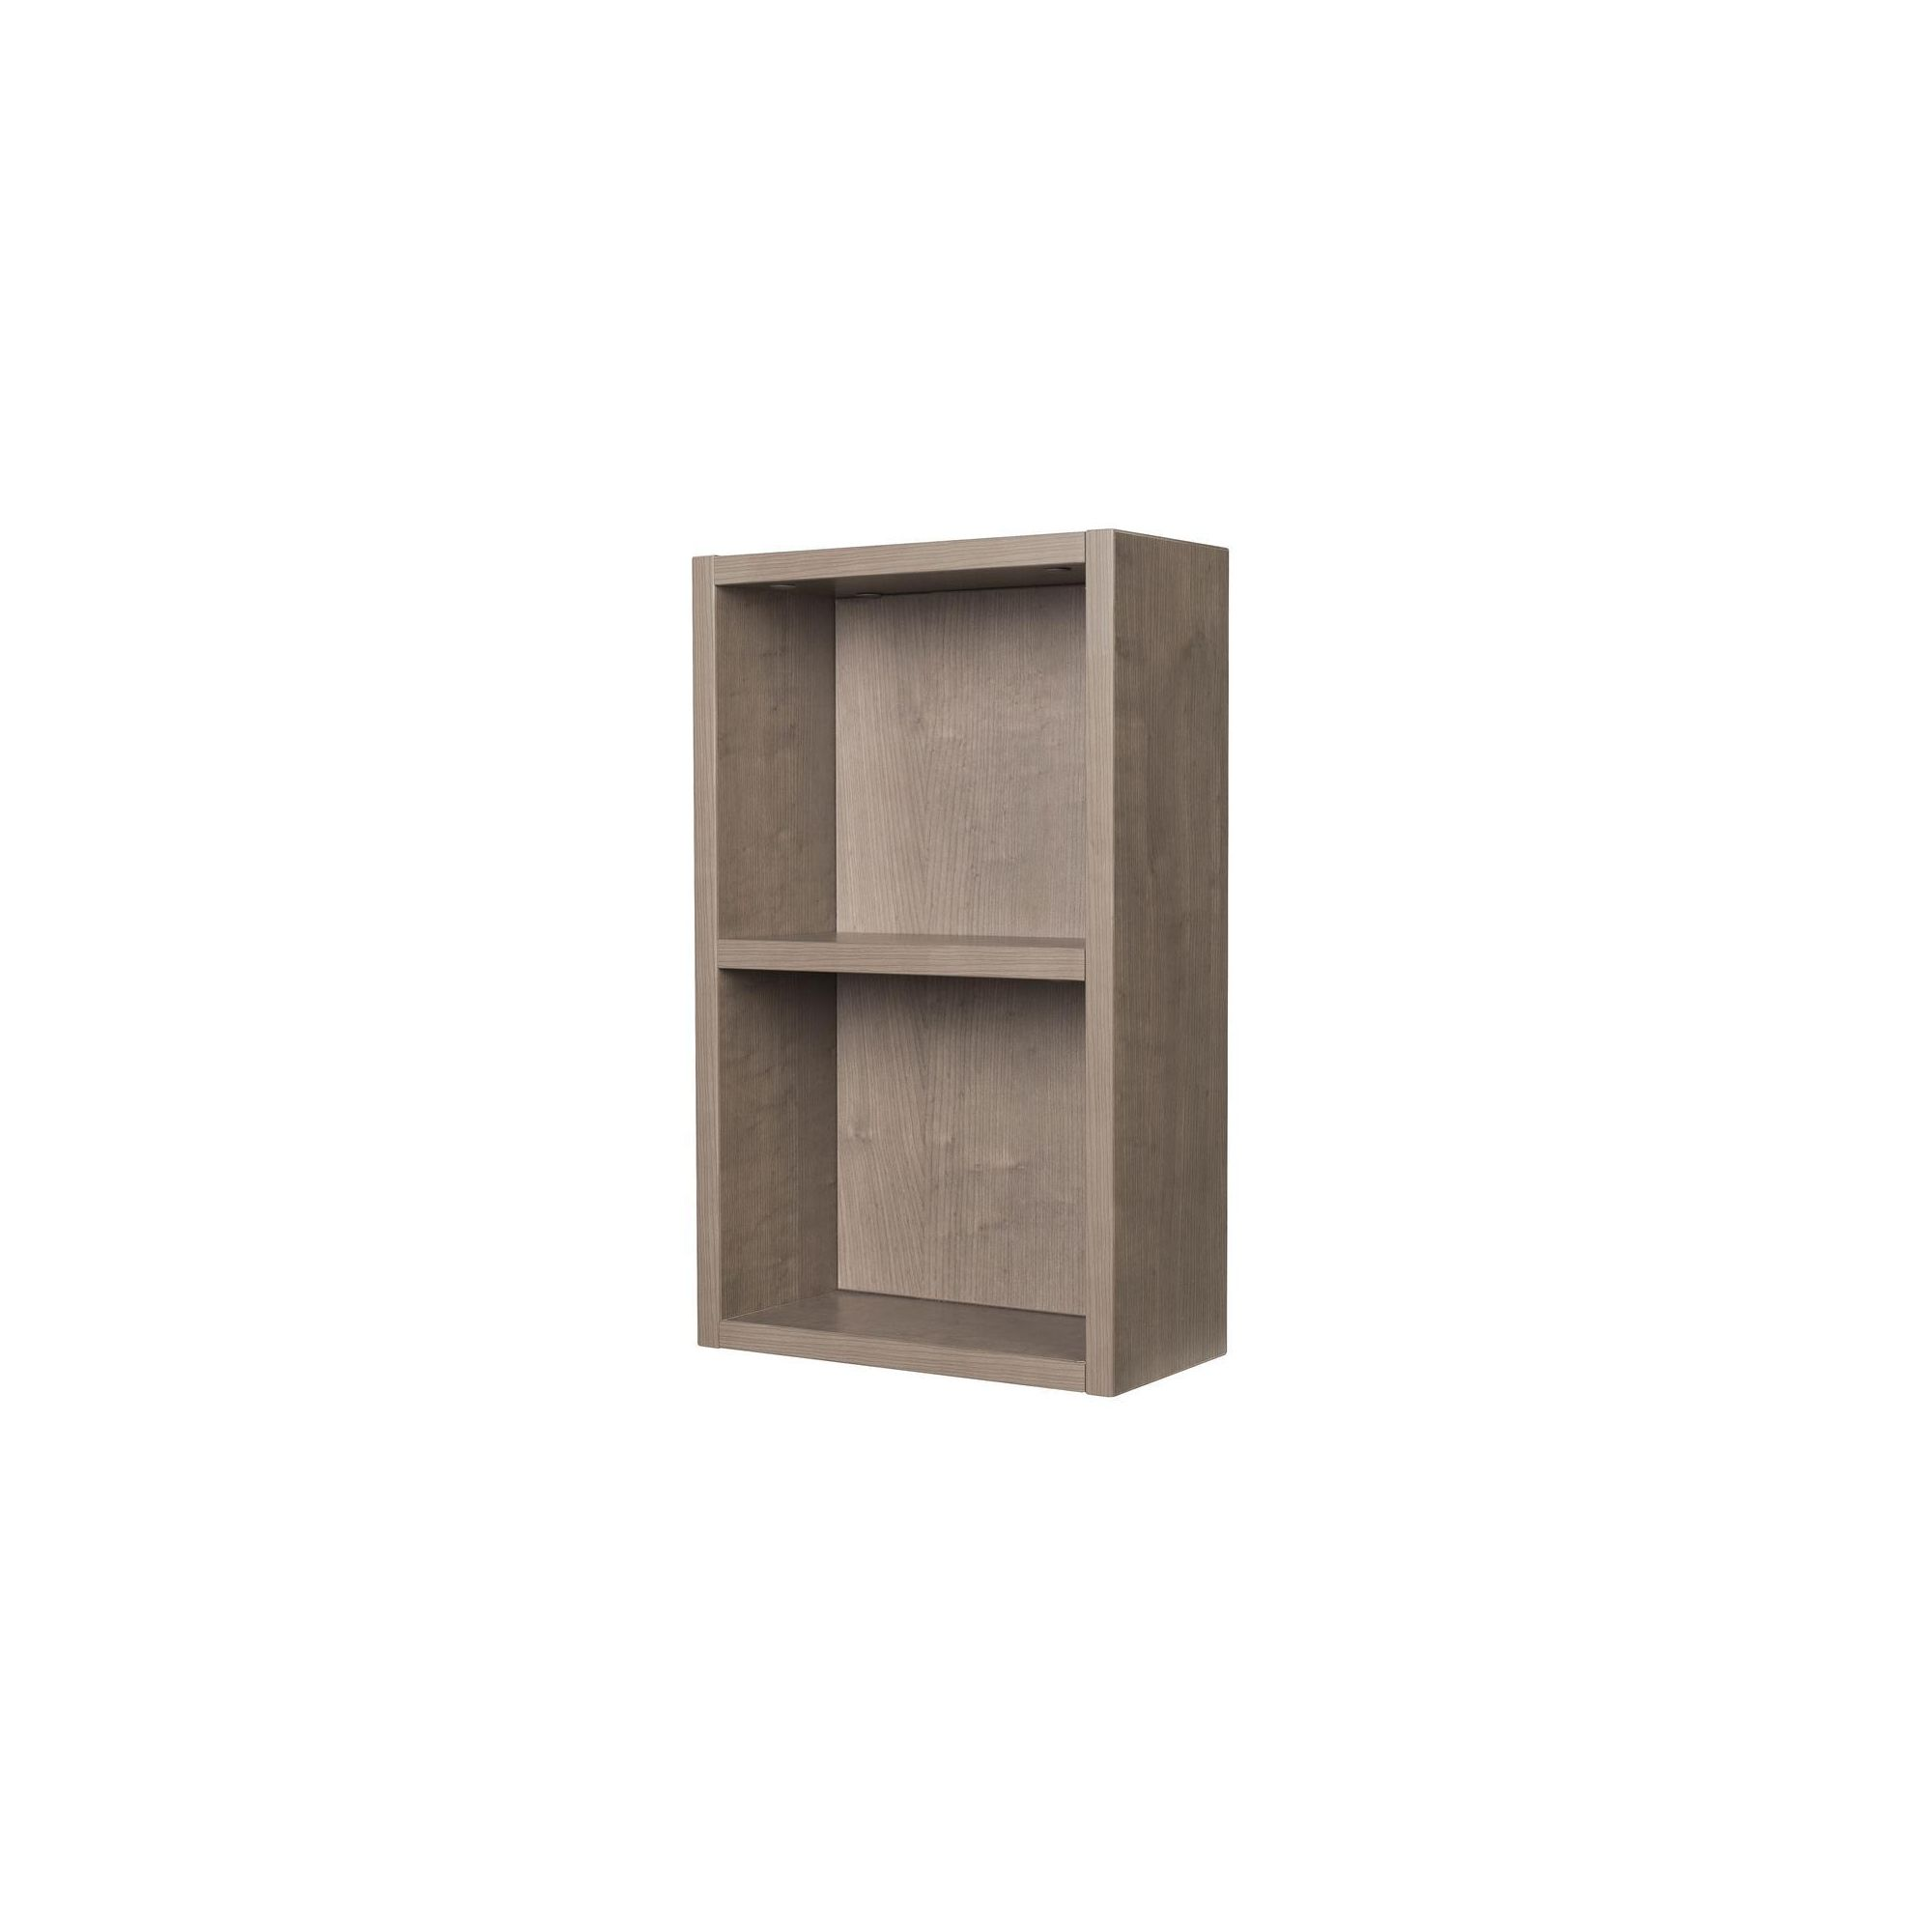 Premier Relax Wall Mounted Shelf Unit Oak Finish